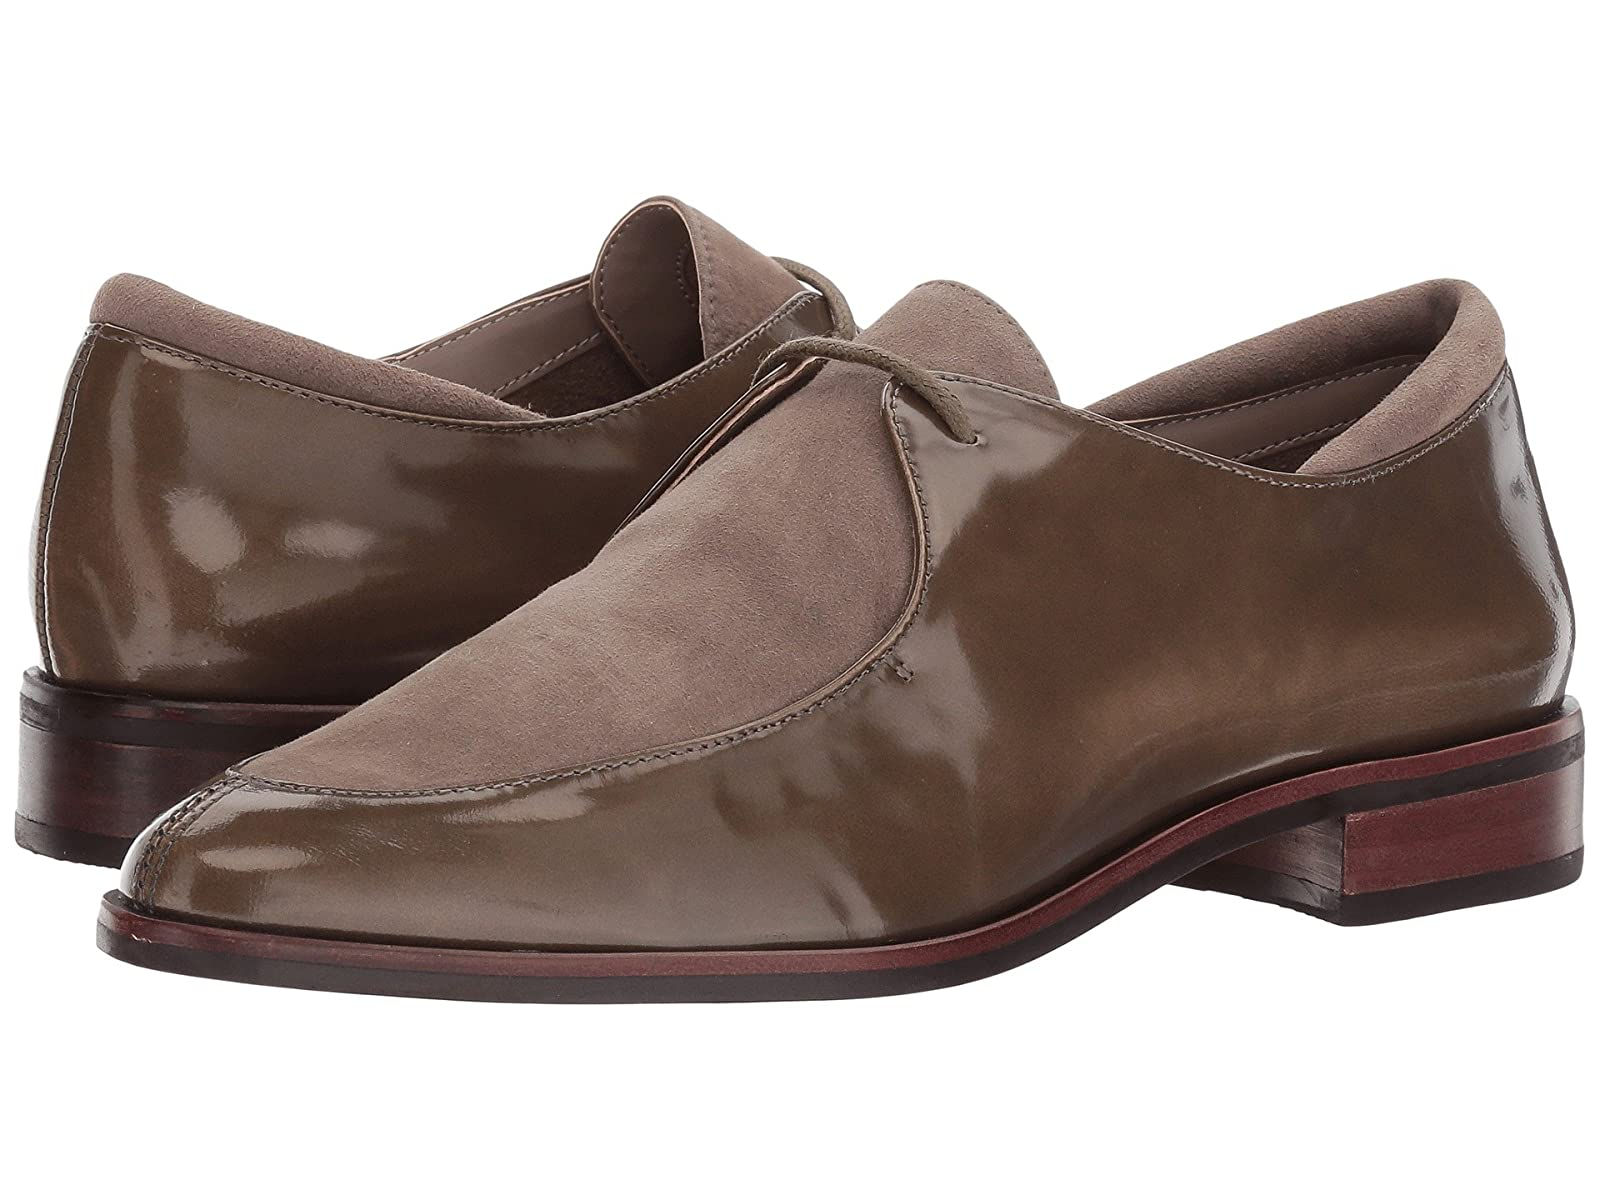 Aerosoles East VillageCheap and distinctive eye-catching shoes